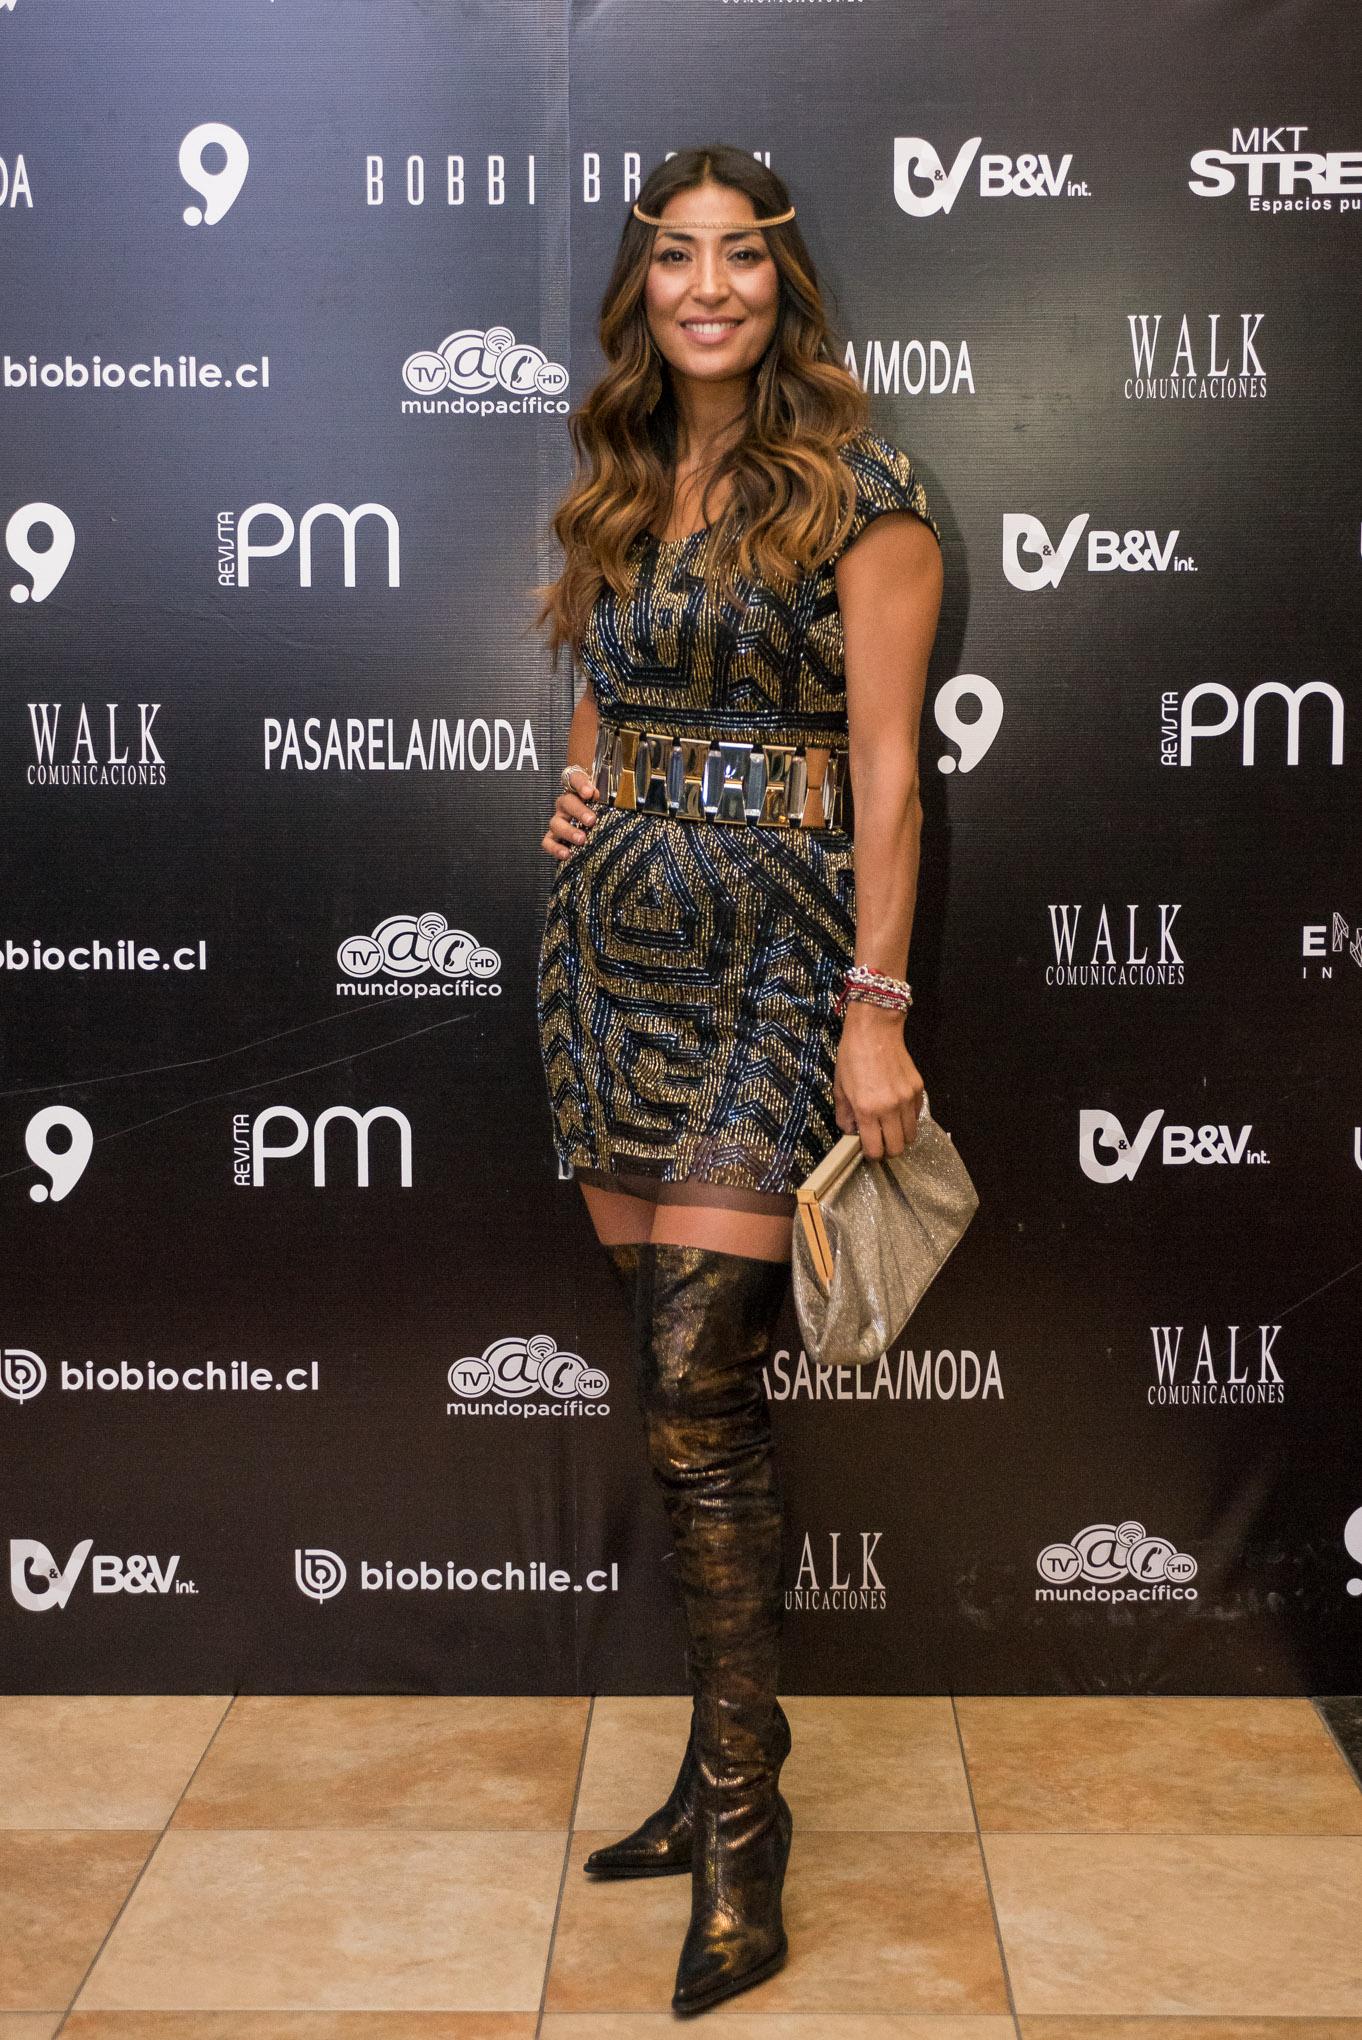 Carola Jorquera en CFW